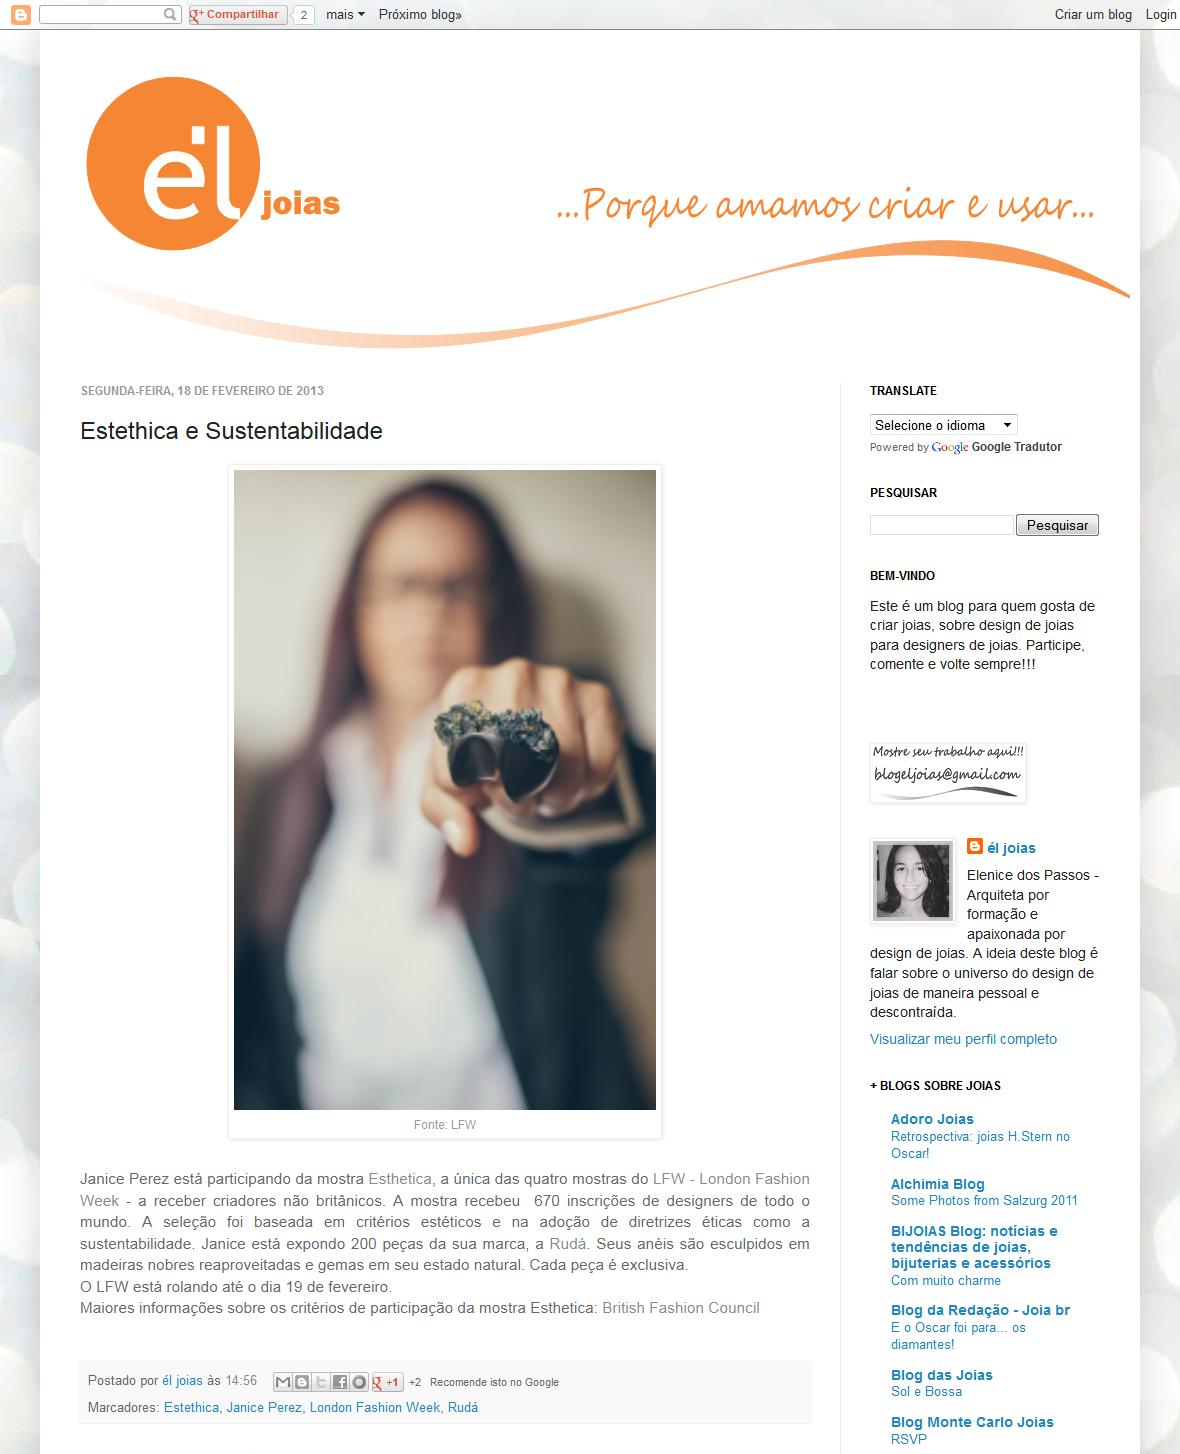 él+Joias+-+design+de+joias+-+eljoias_Estethica+e+Sustentabilidade_2013